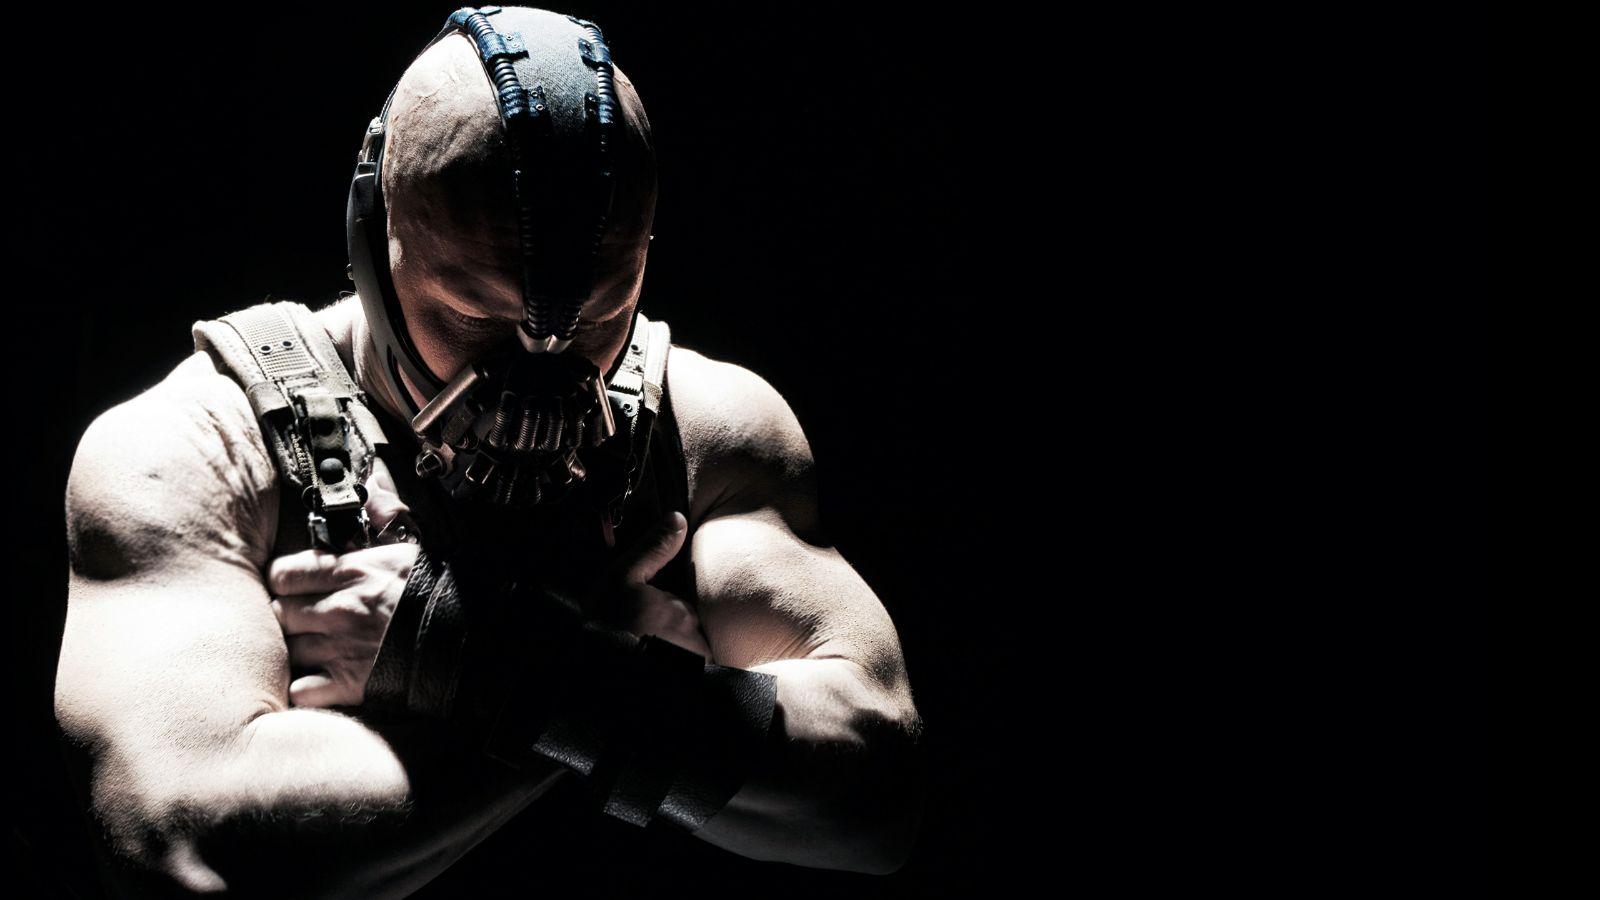 Dark Knight Rises image